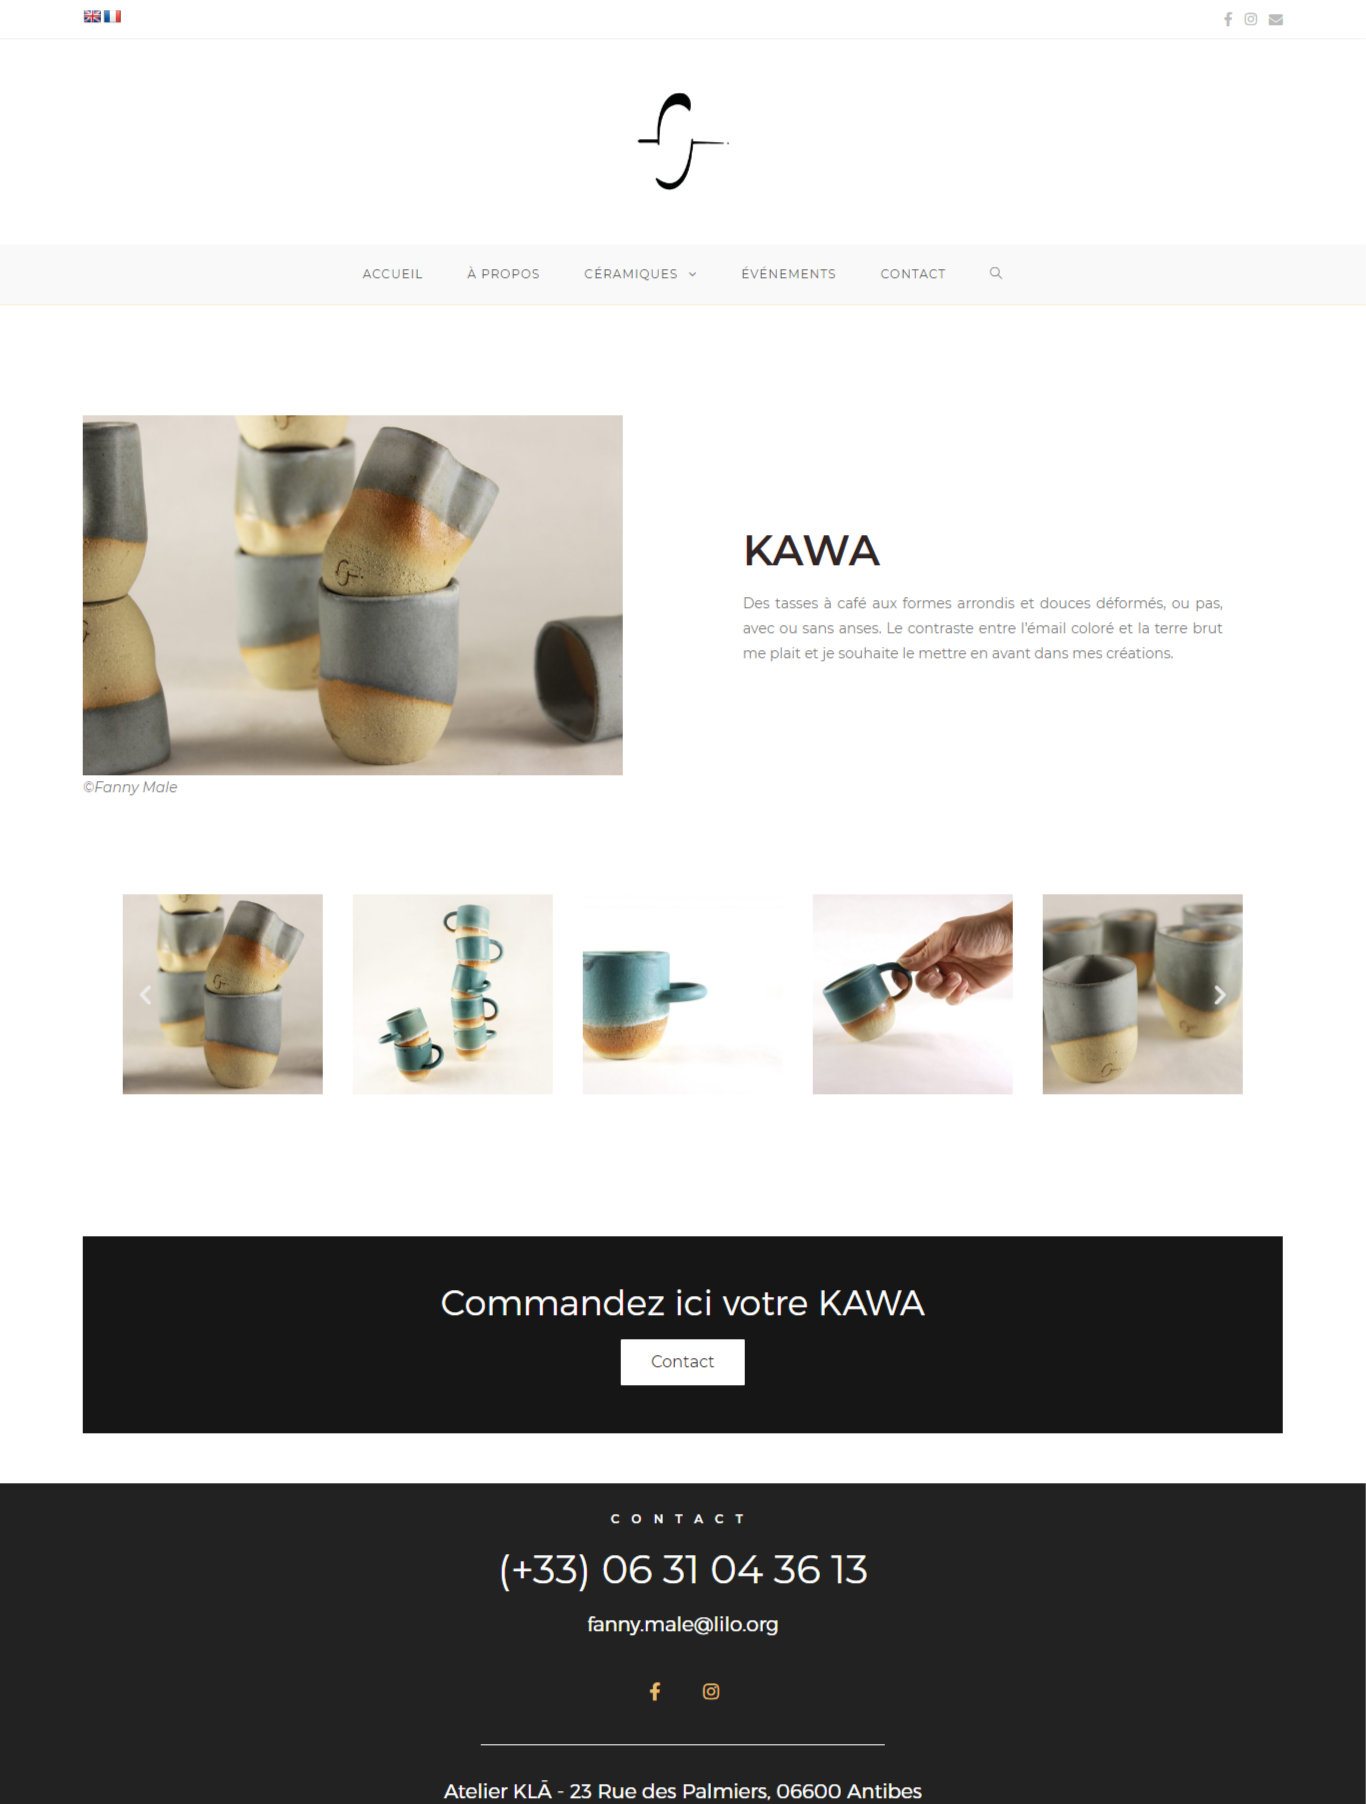 kawa - Fanny Male_présentation_kawa_création_site_internet_albi